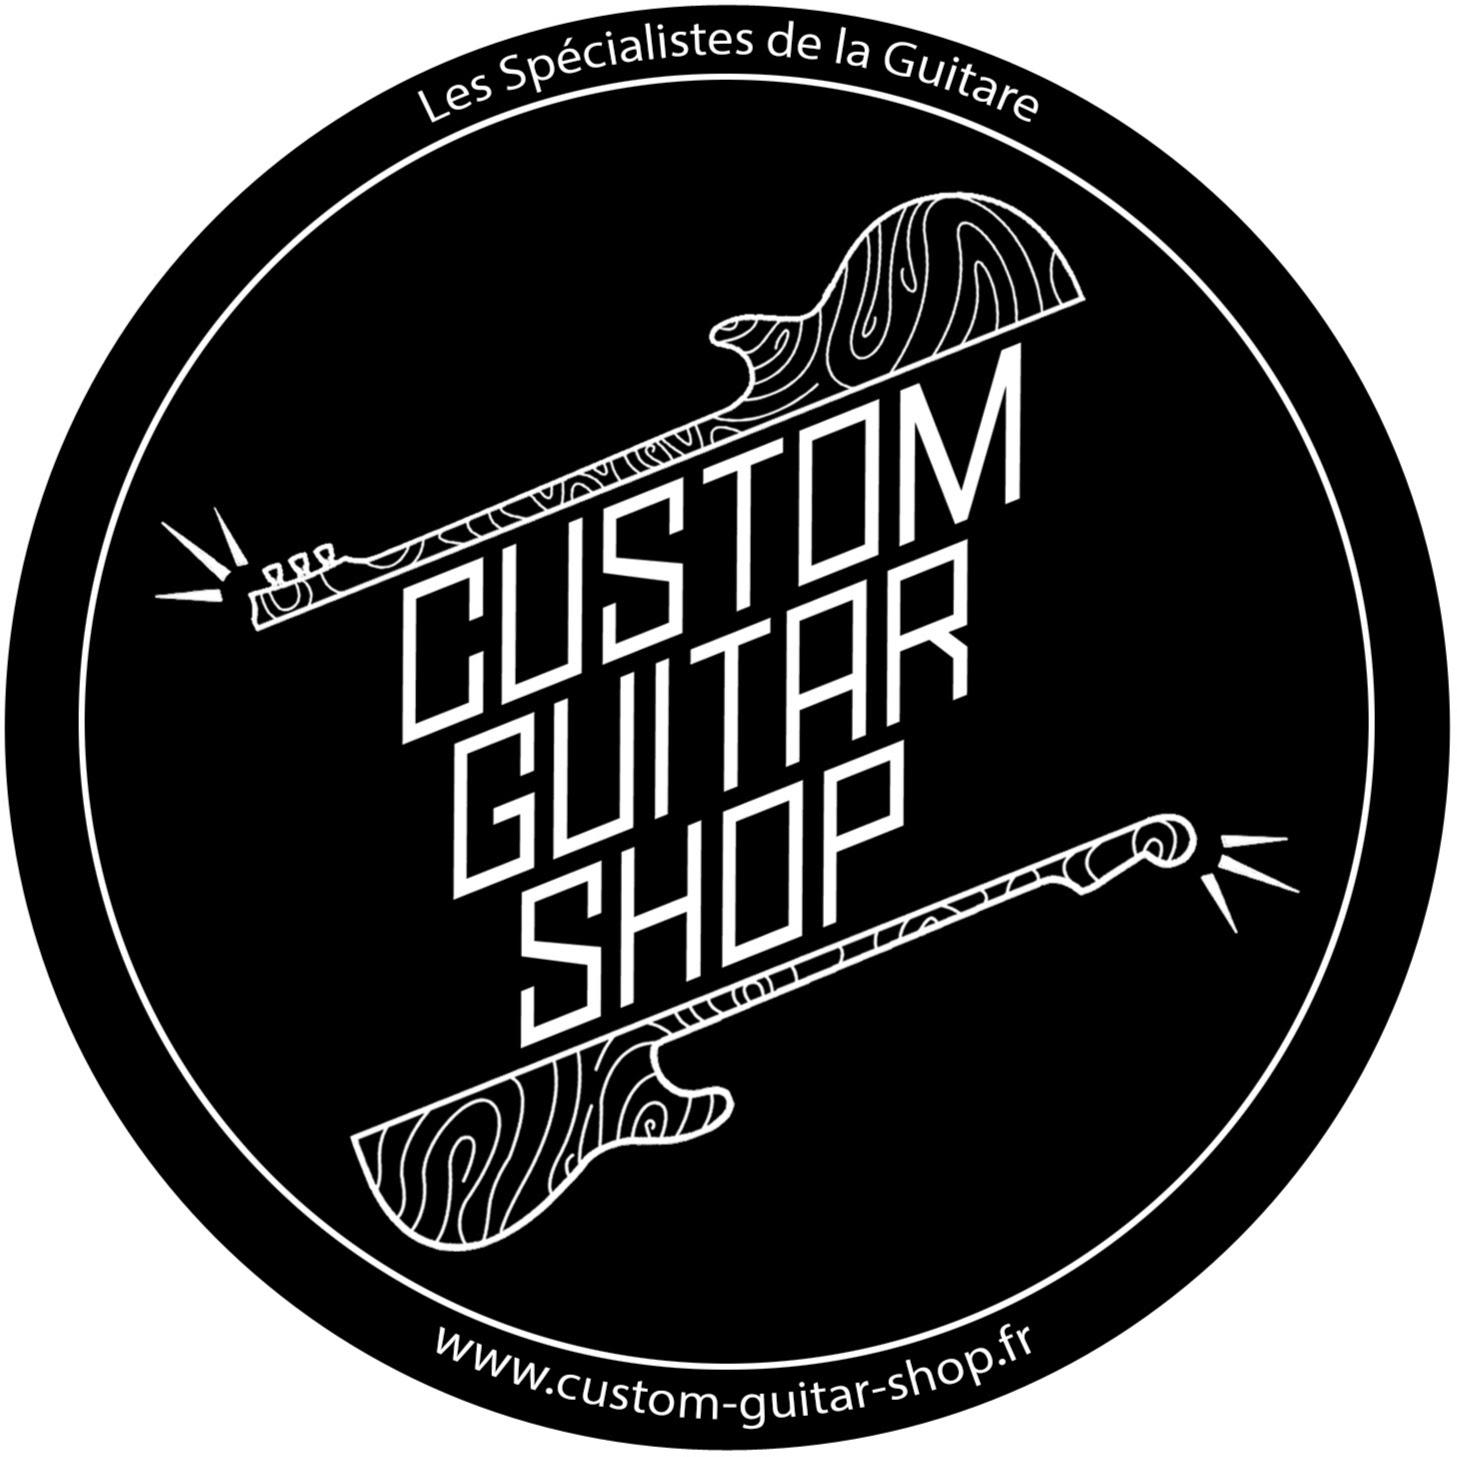 Custom Guitar Shop store